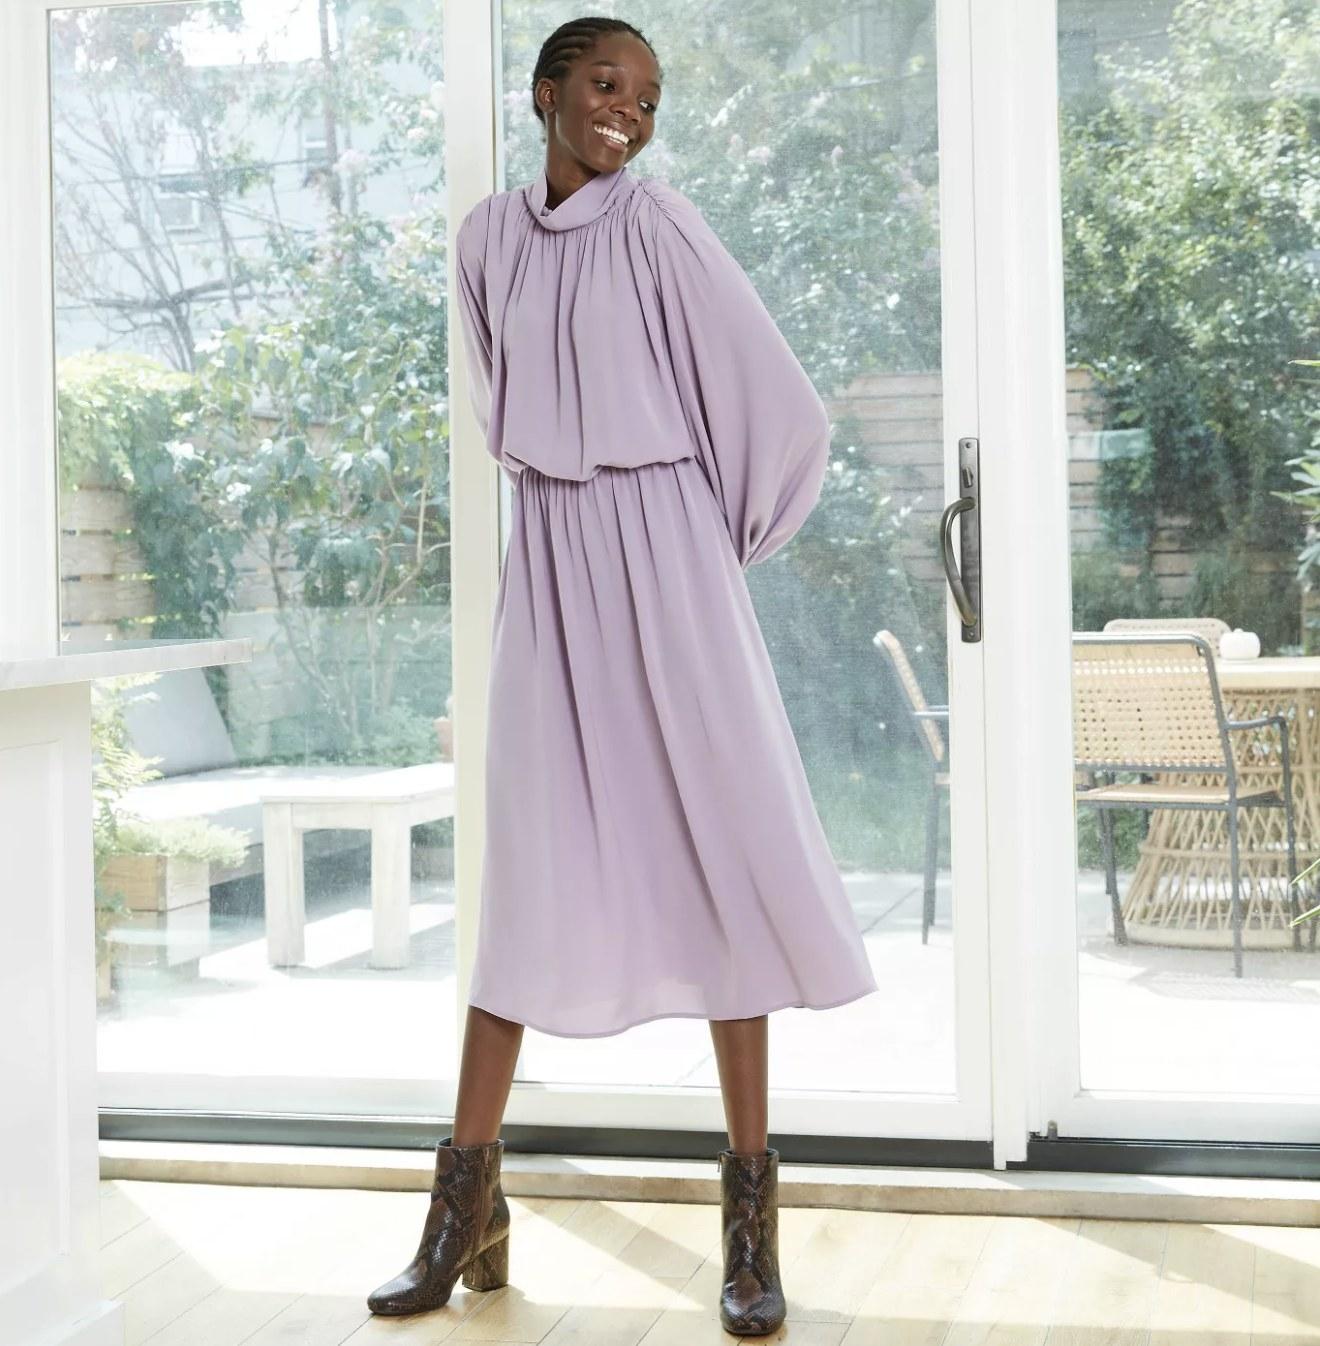 long-sleeve midi dress in purple with drapery